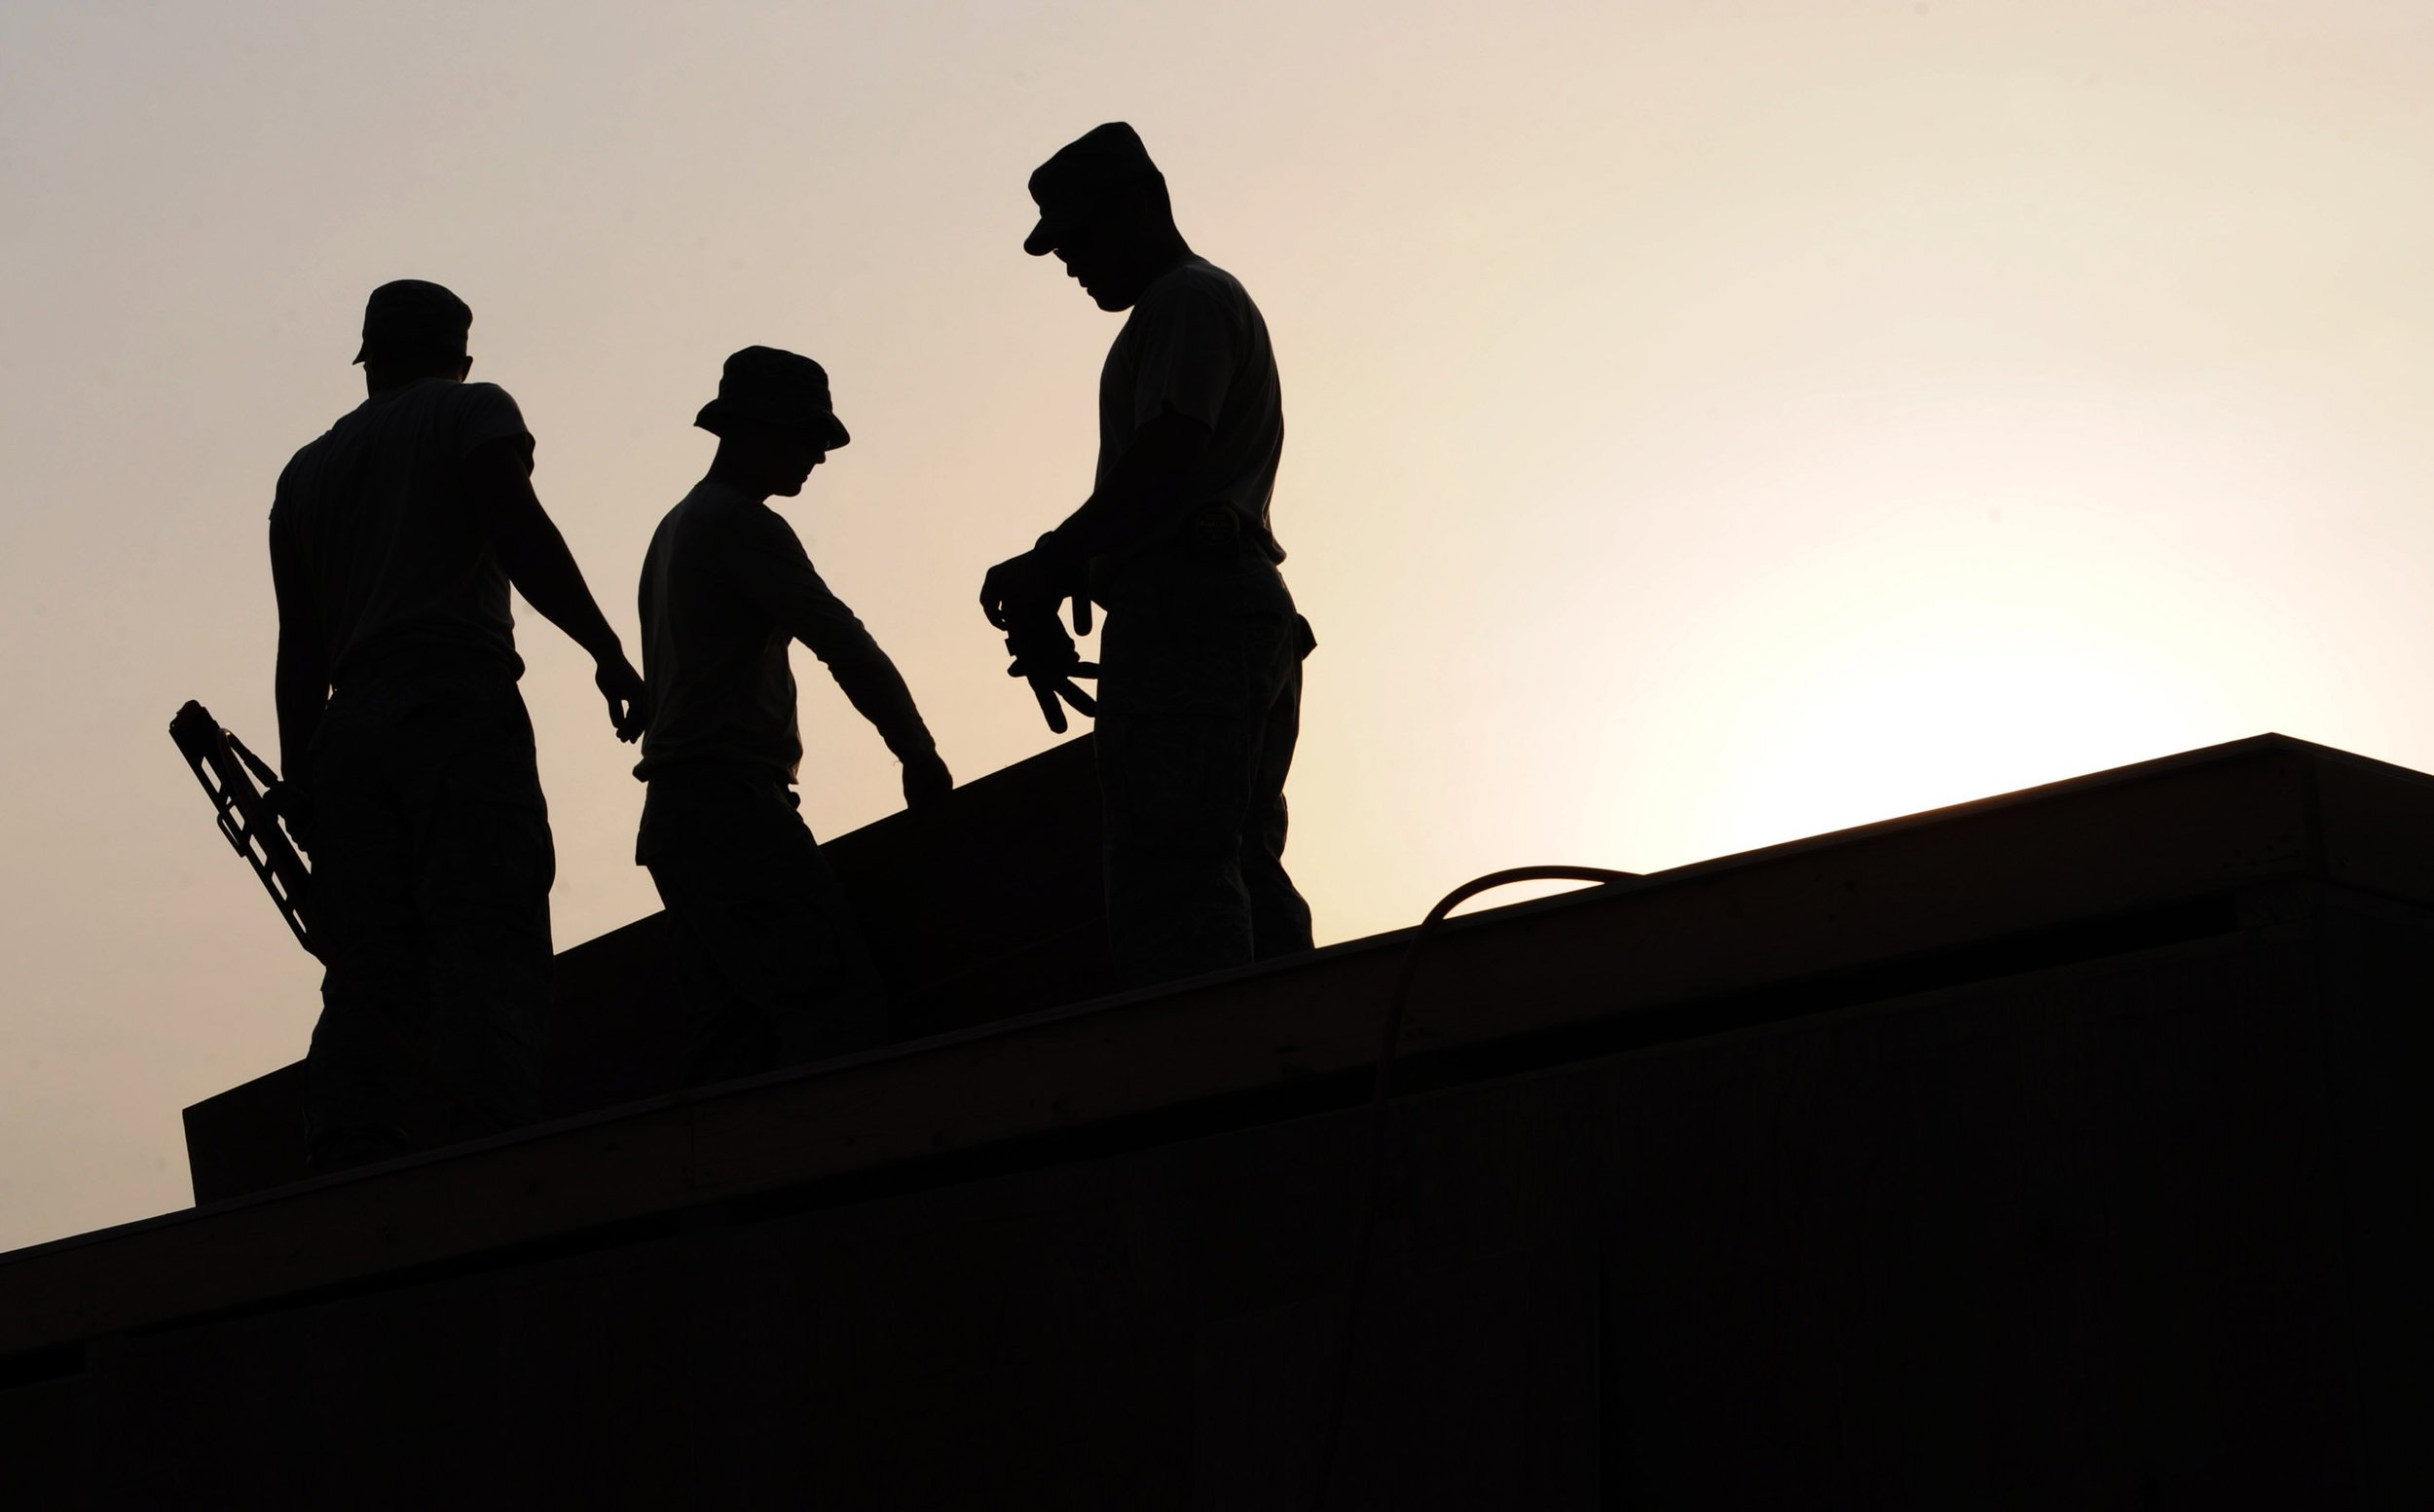 black-and-white-construction-job-38293.jpg